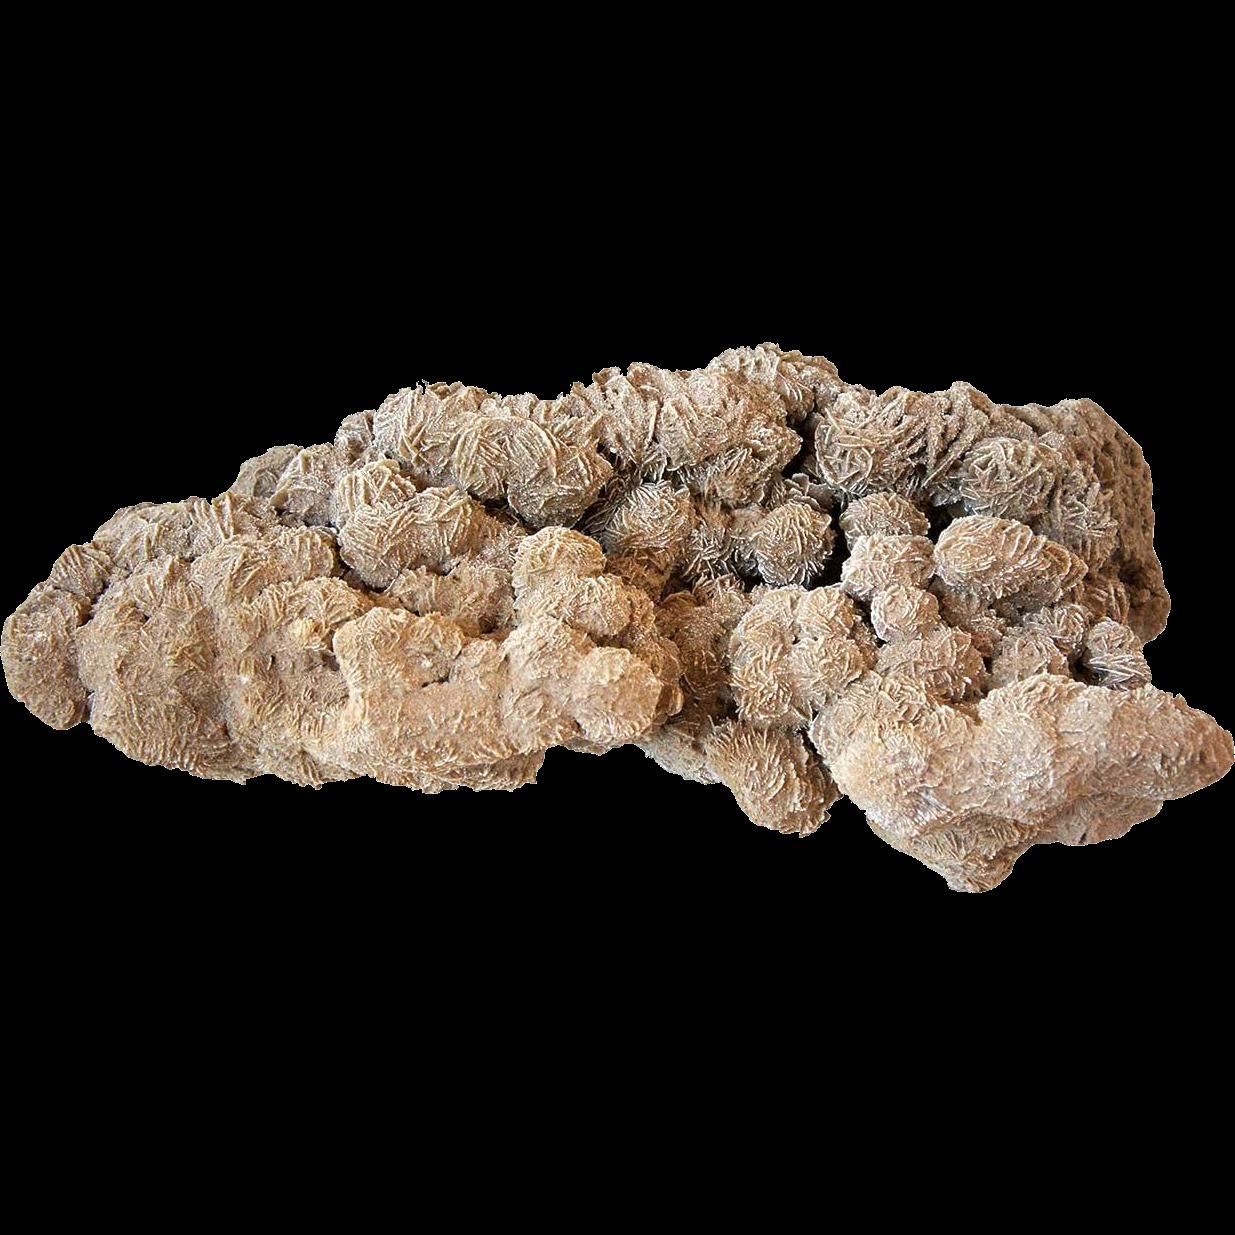 Very Large Selenite Desert Rose Crystal Cluster Rock Formation